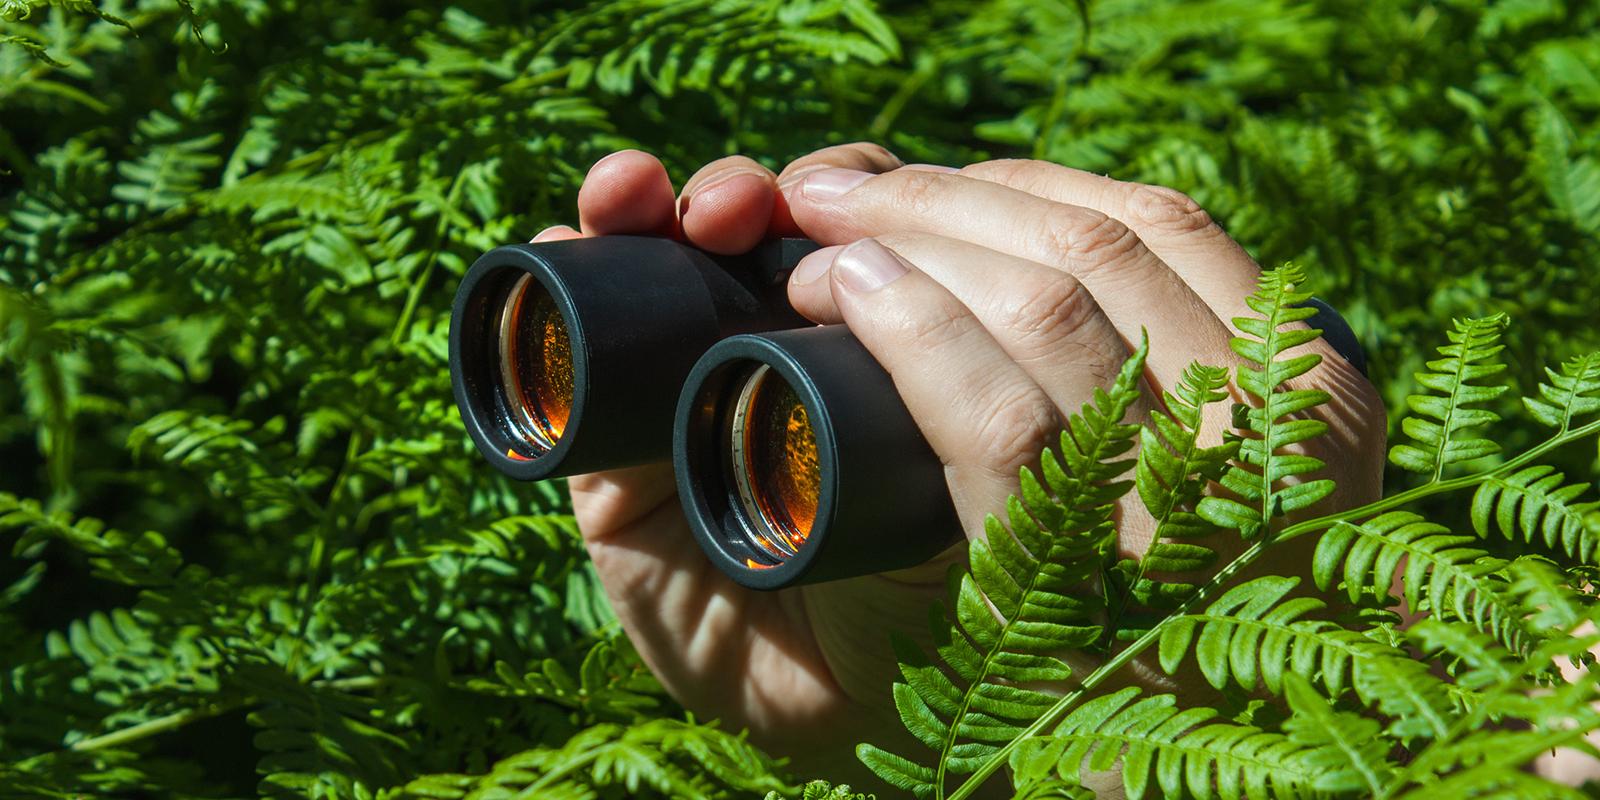 Image: Binoculars